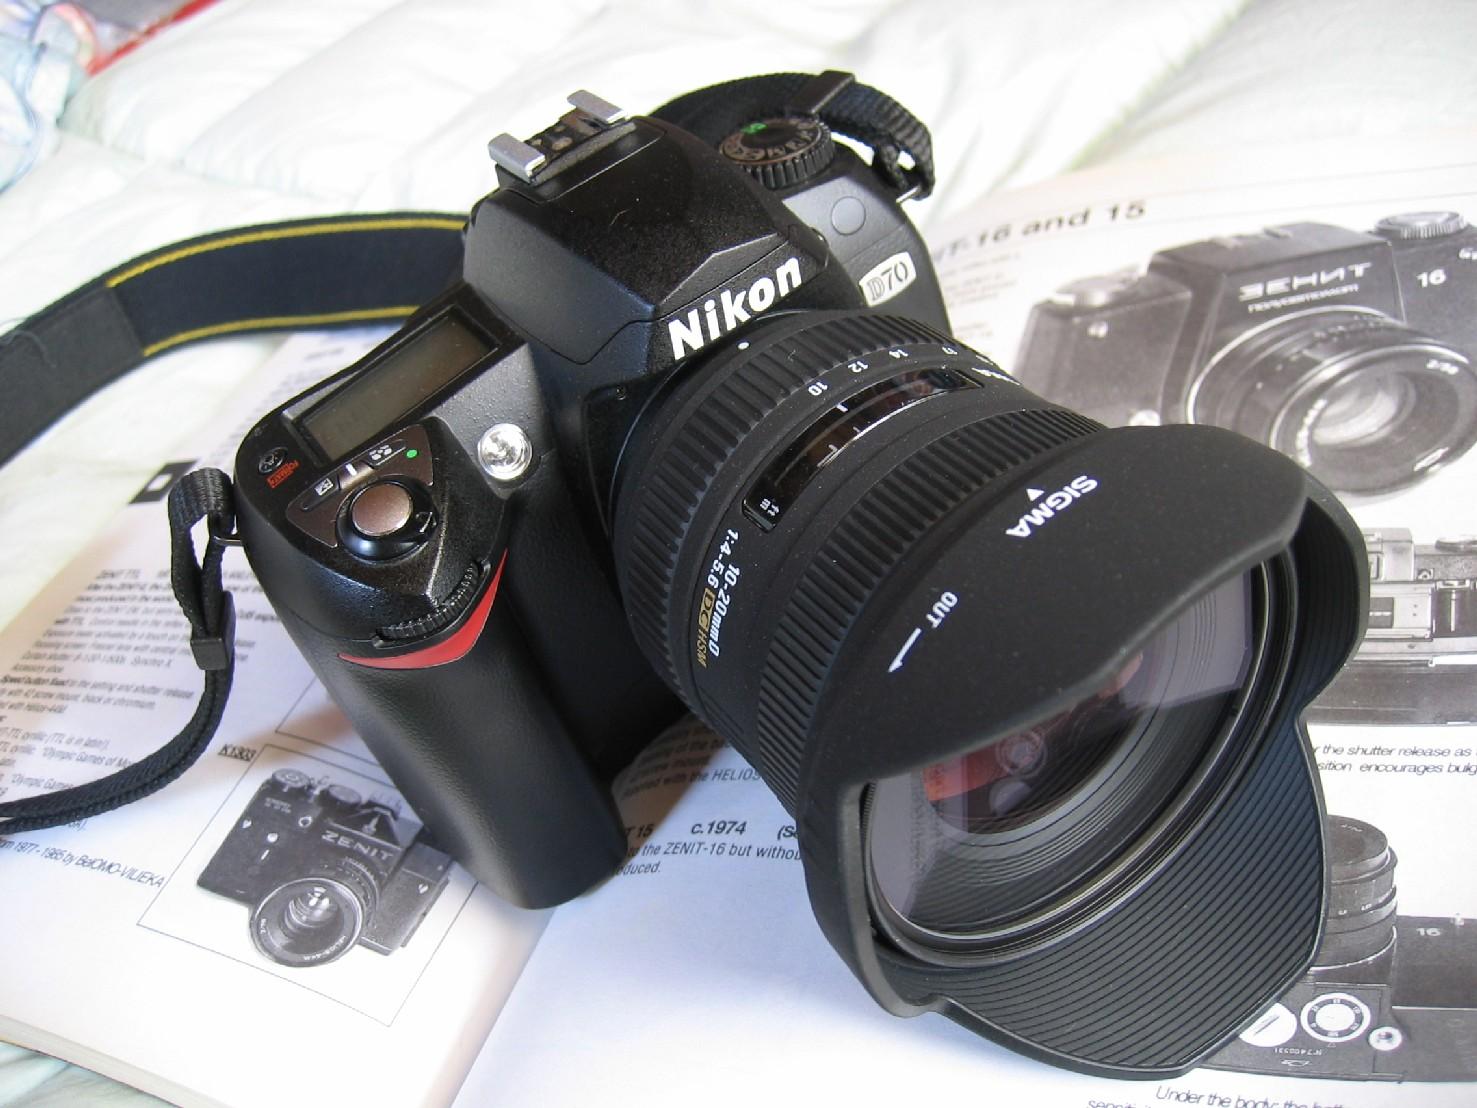 SIGMA 10-20mm F4-5.6 EX DC_b0069128_1439640.jpg